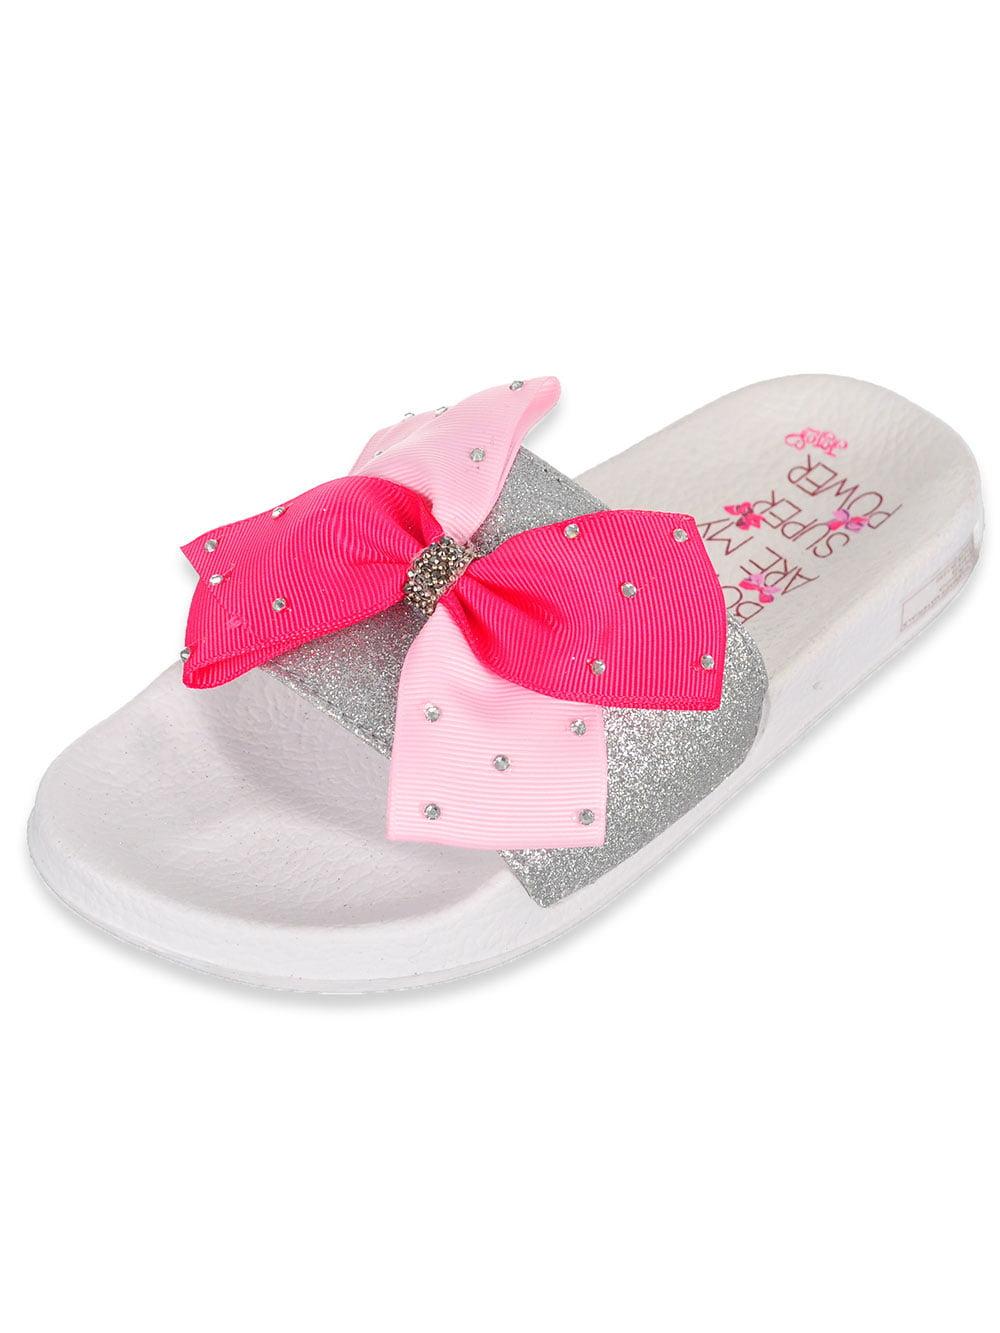 Sizes 13-5 Jojo Siwa Girls/' Slide Sandals